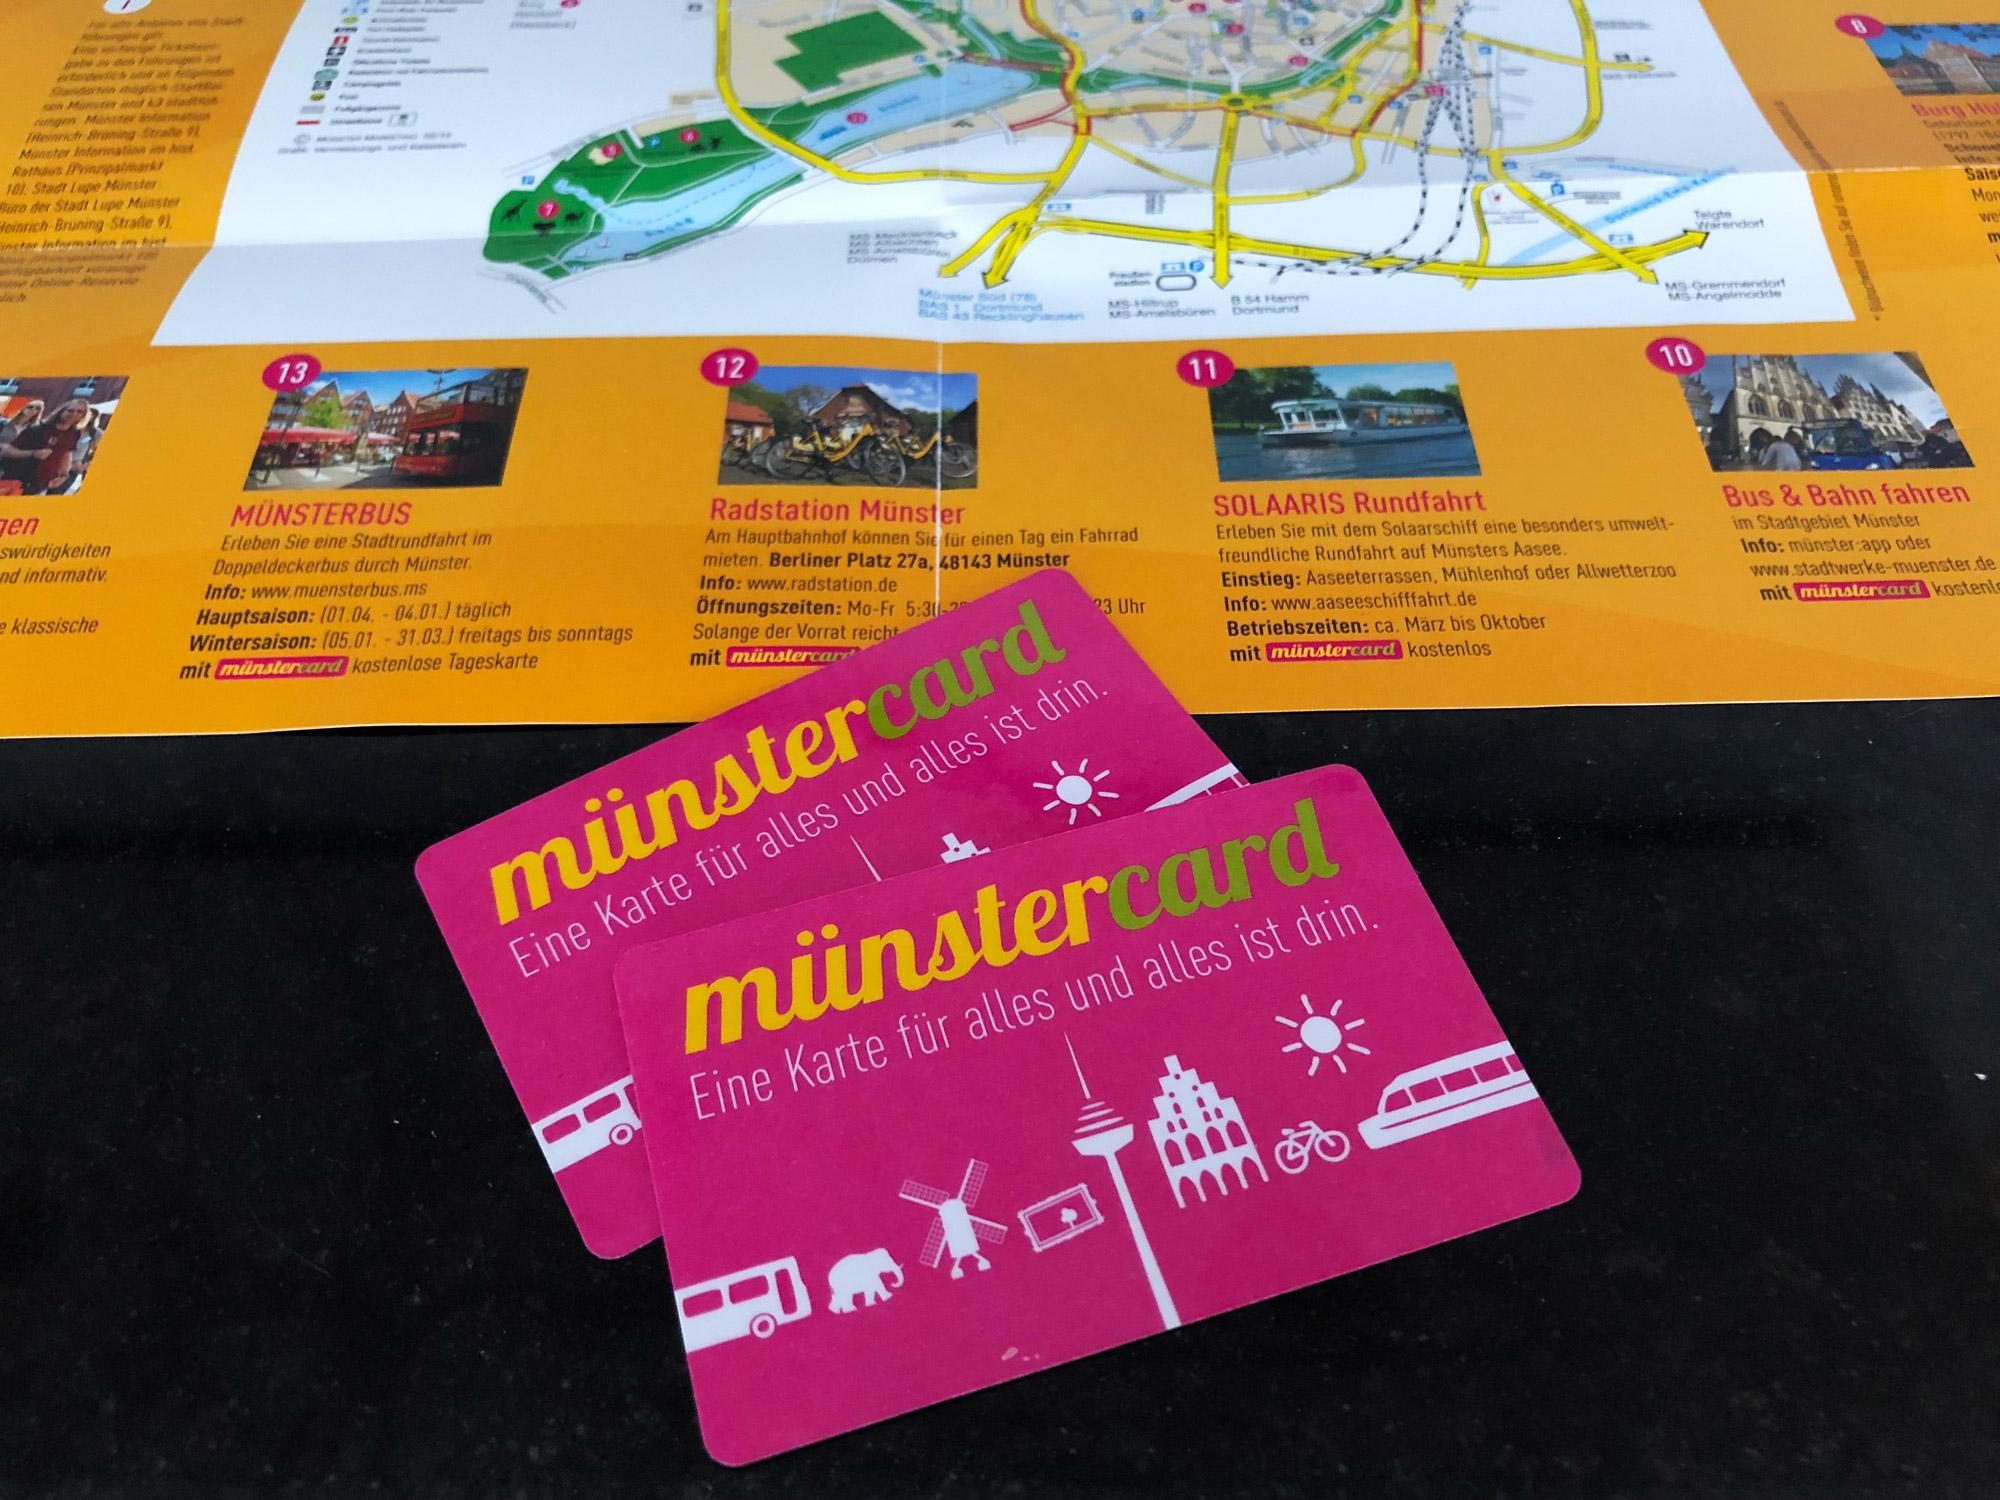 9x doen in Münster - Münstercard